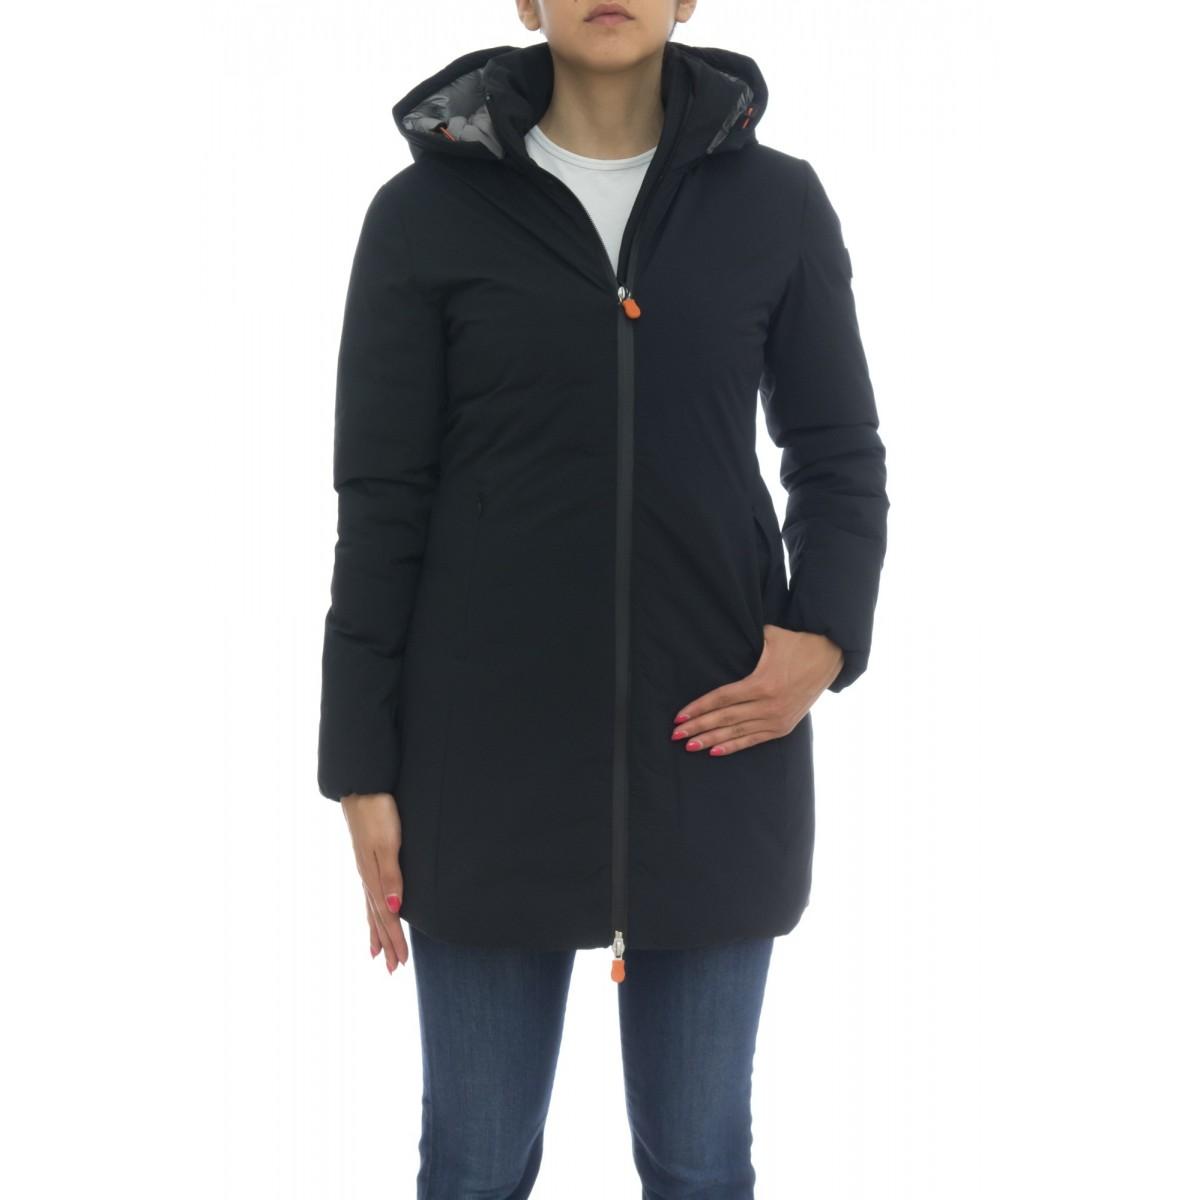 Piumino - D4006w matt7 cappottino